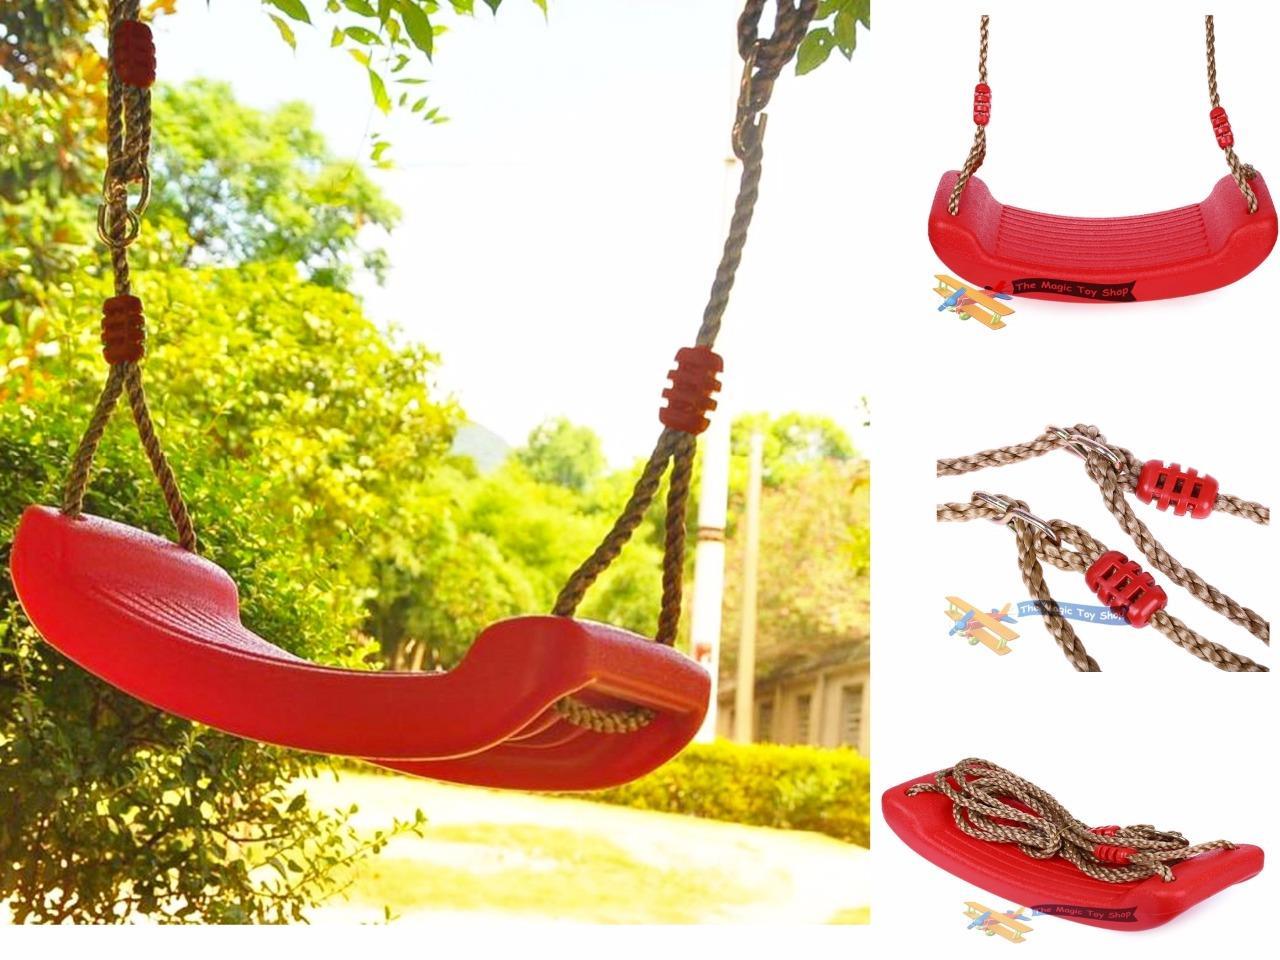 Set of Wooden Monkey Bar Trapeze Rope Swing /& Plastic Swing Seat Garden Toy